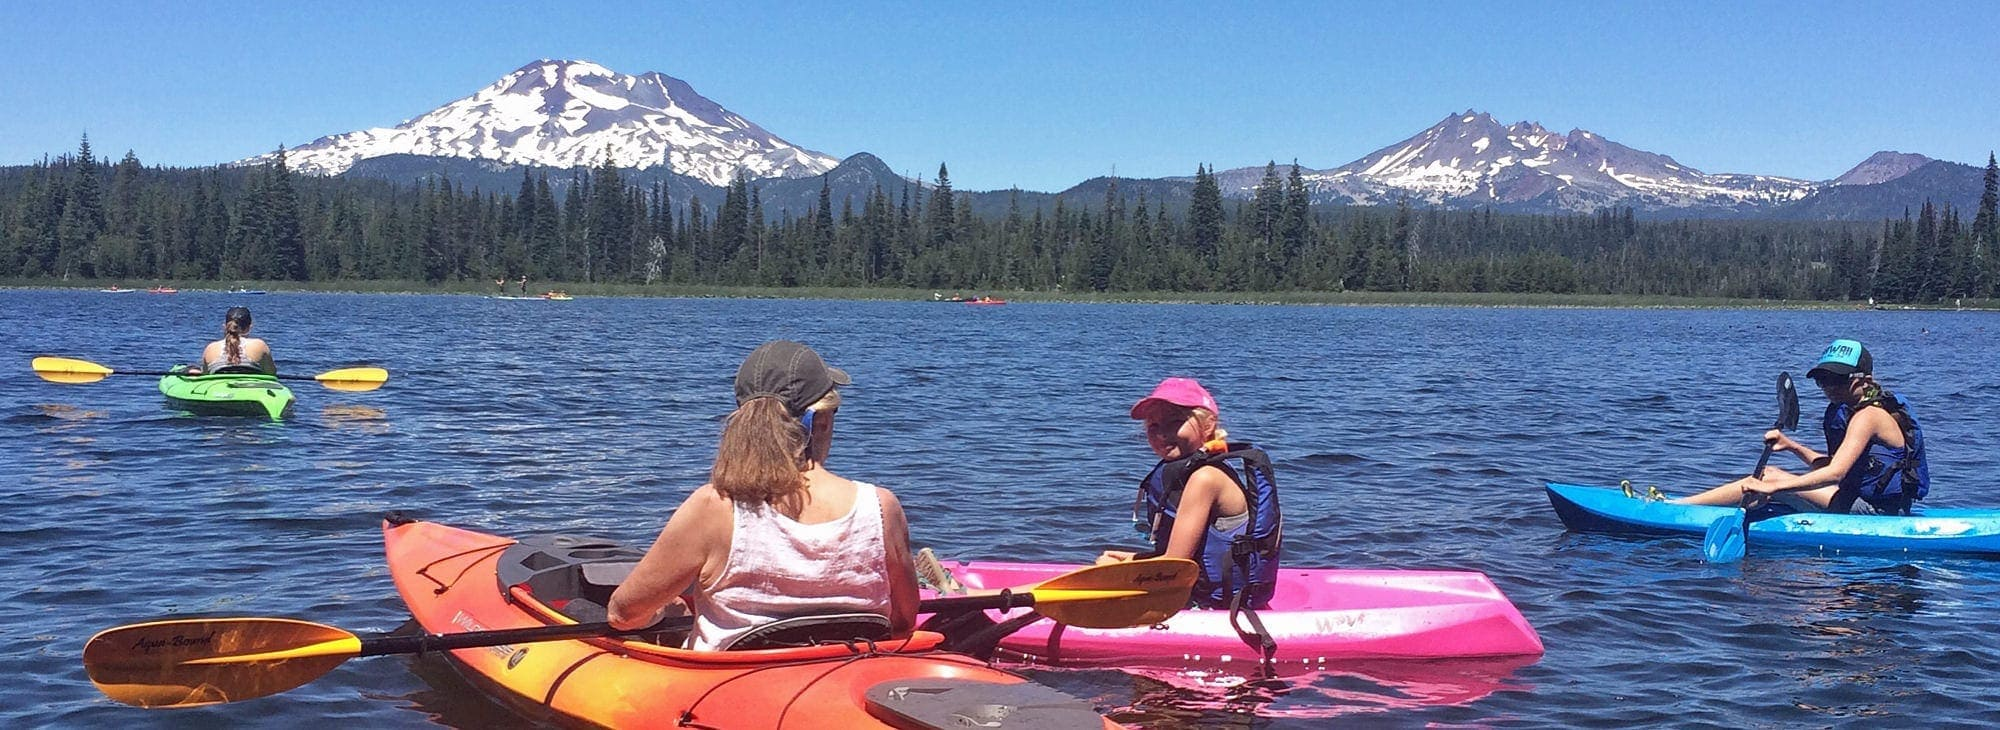 Hosmer Lake near the Cascade Lakes Scenic Byway